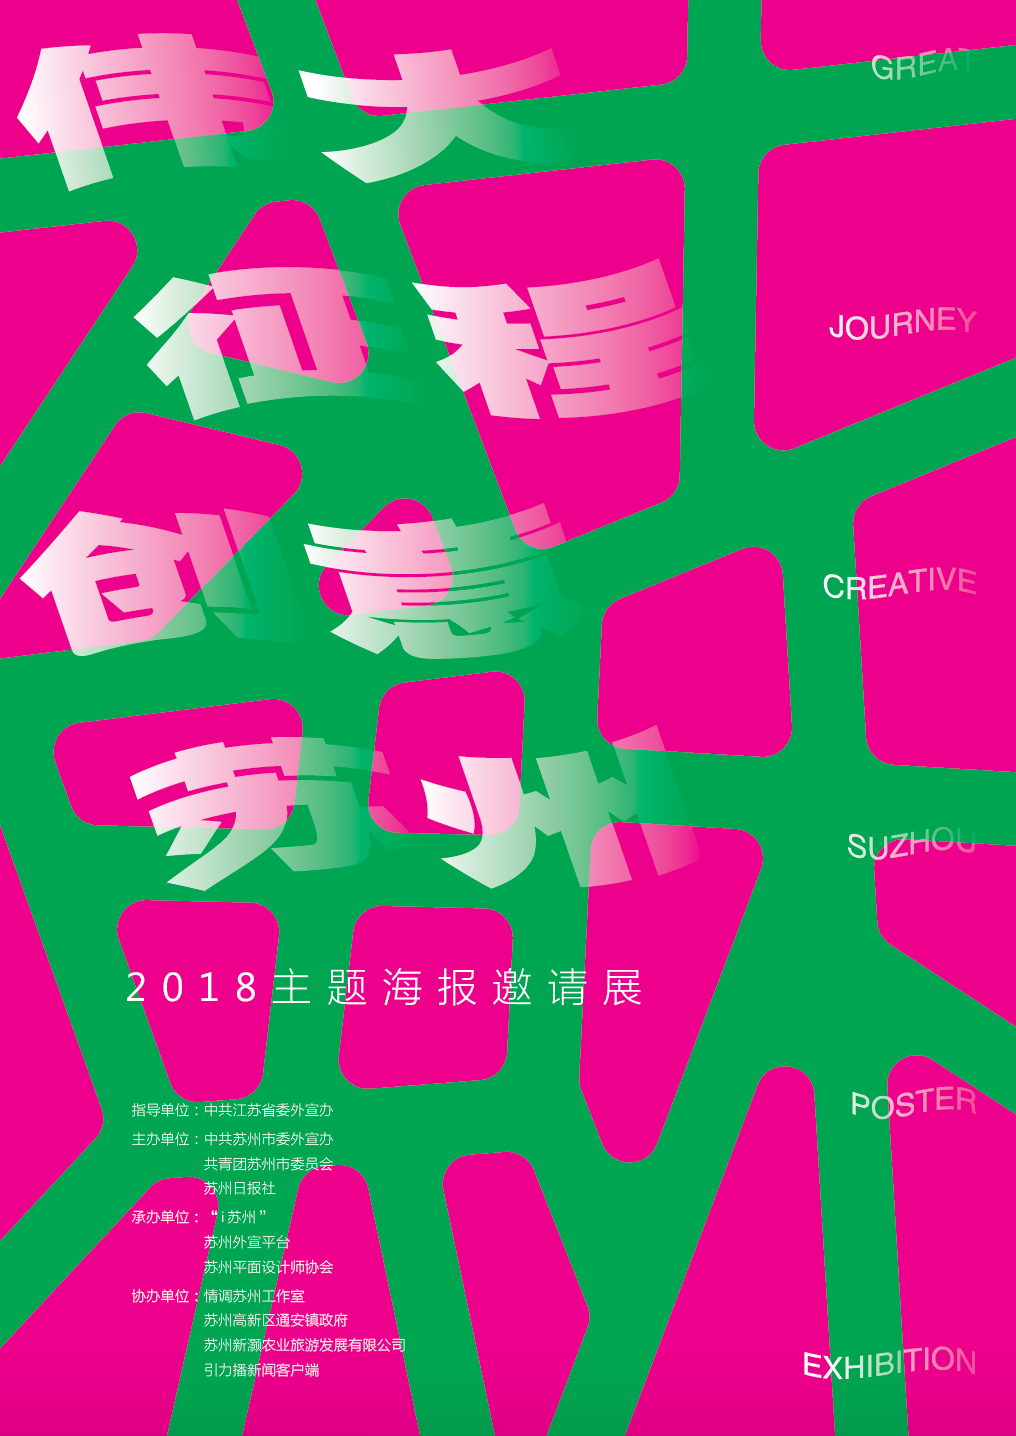 The Great Creative Suzhou / Poster poster Francesco Mazzenga graphic design  poster art